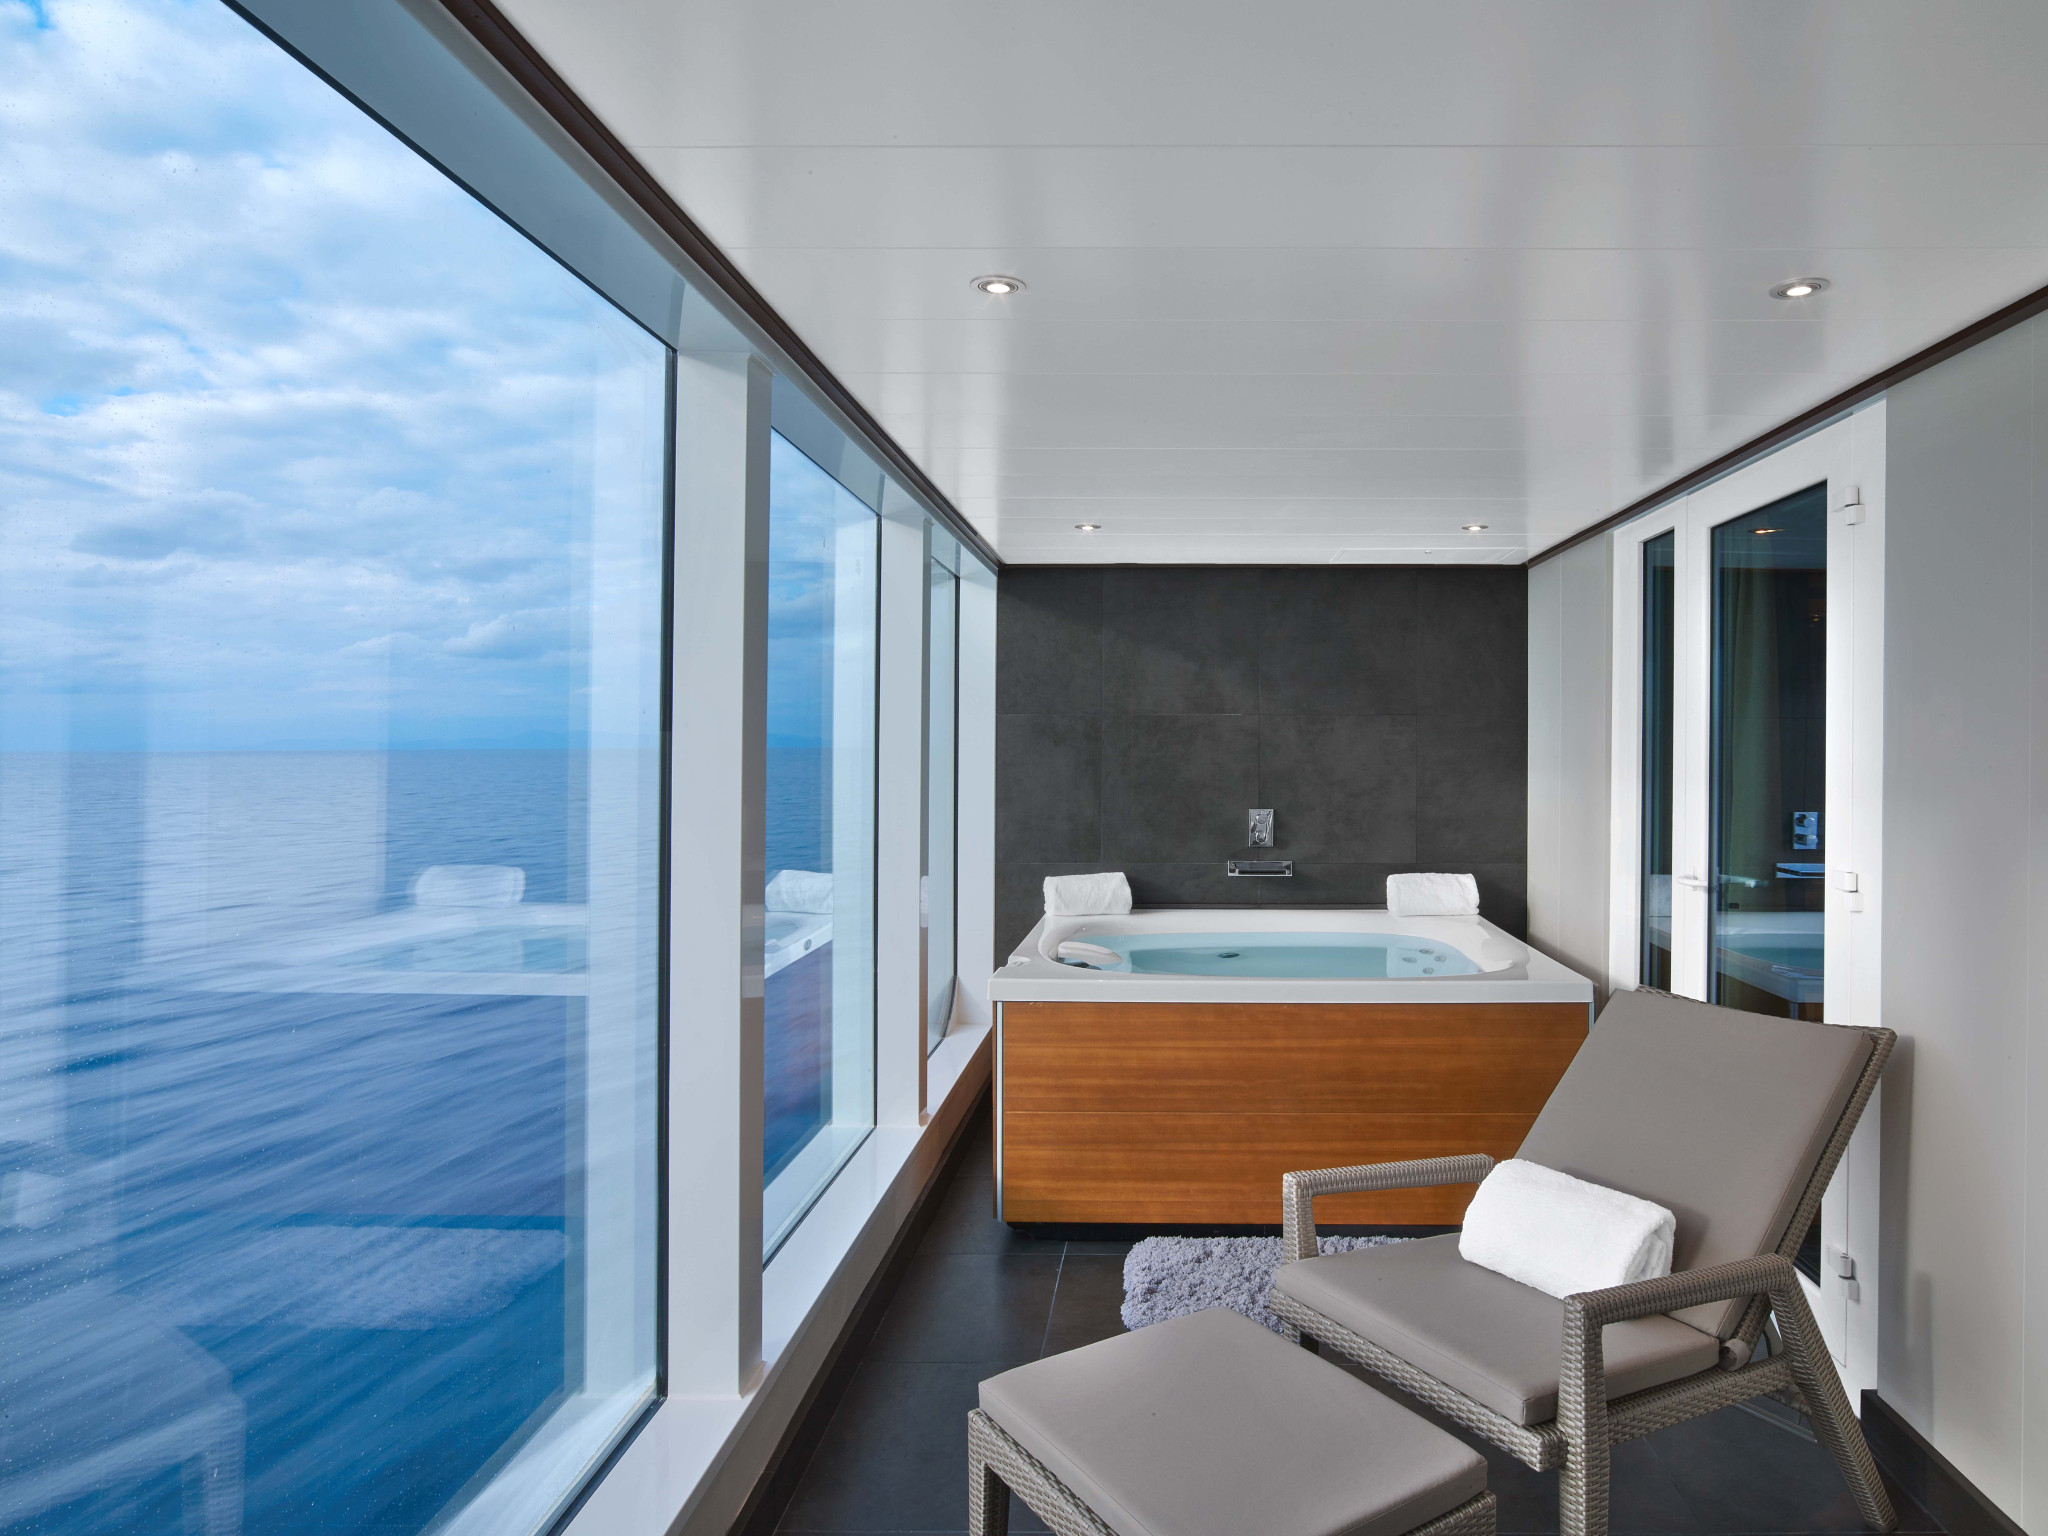 Wintergarden Suite onboard the Seabourn Encore